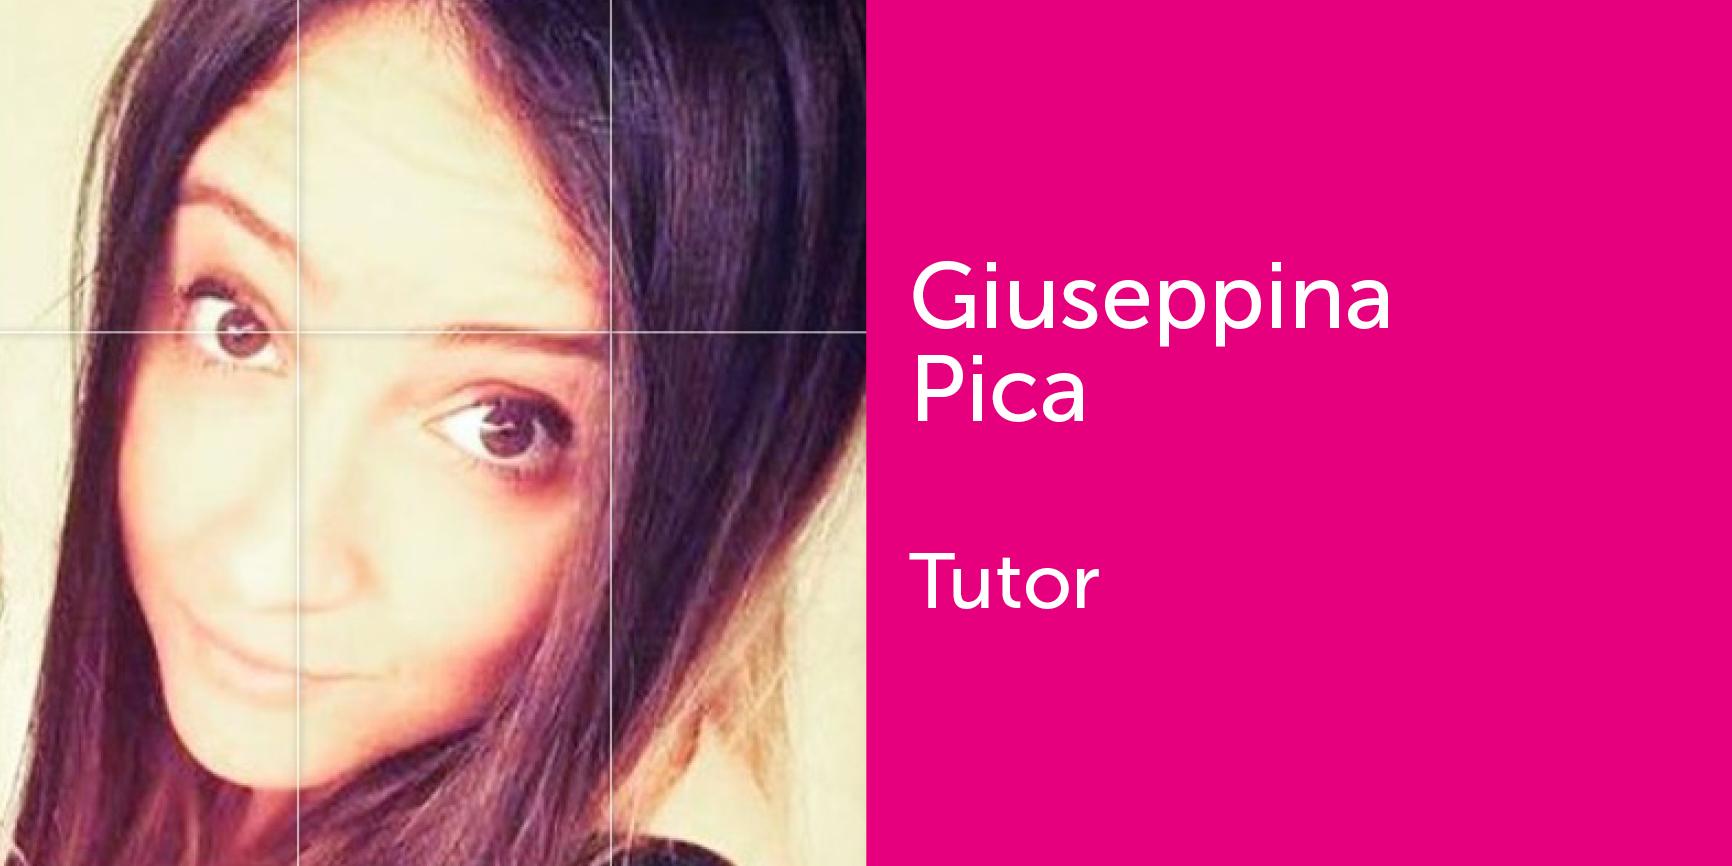 Giuseppina Pica - Tutor